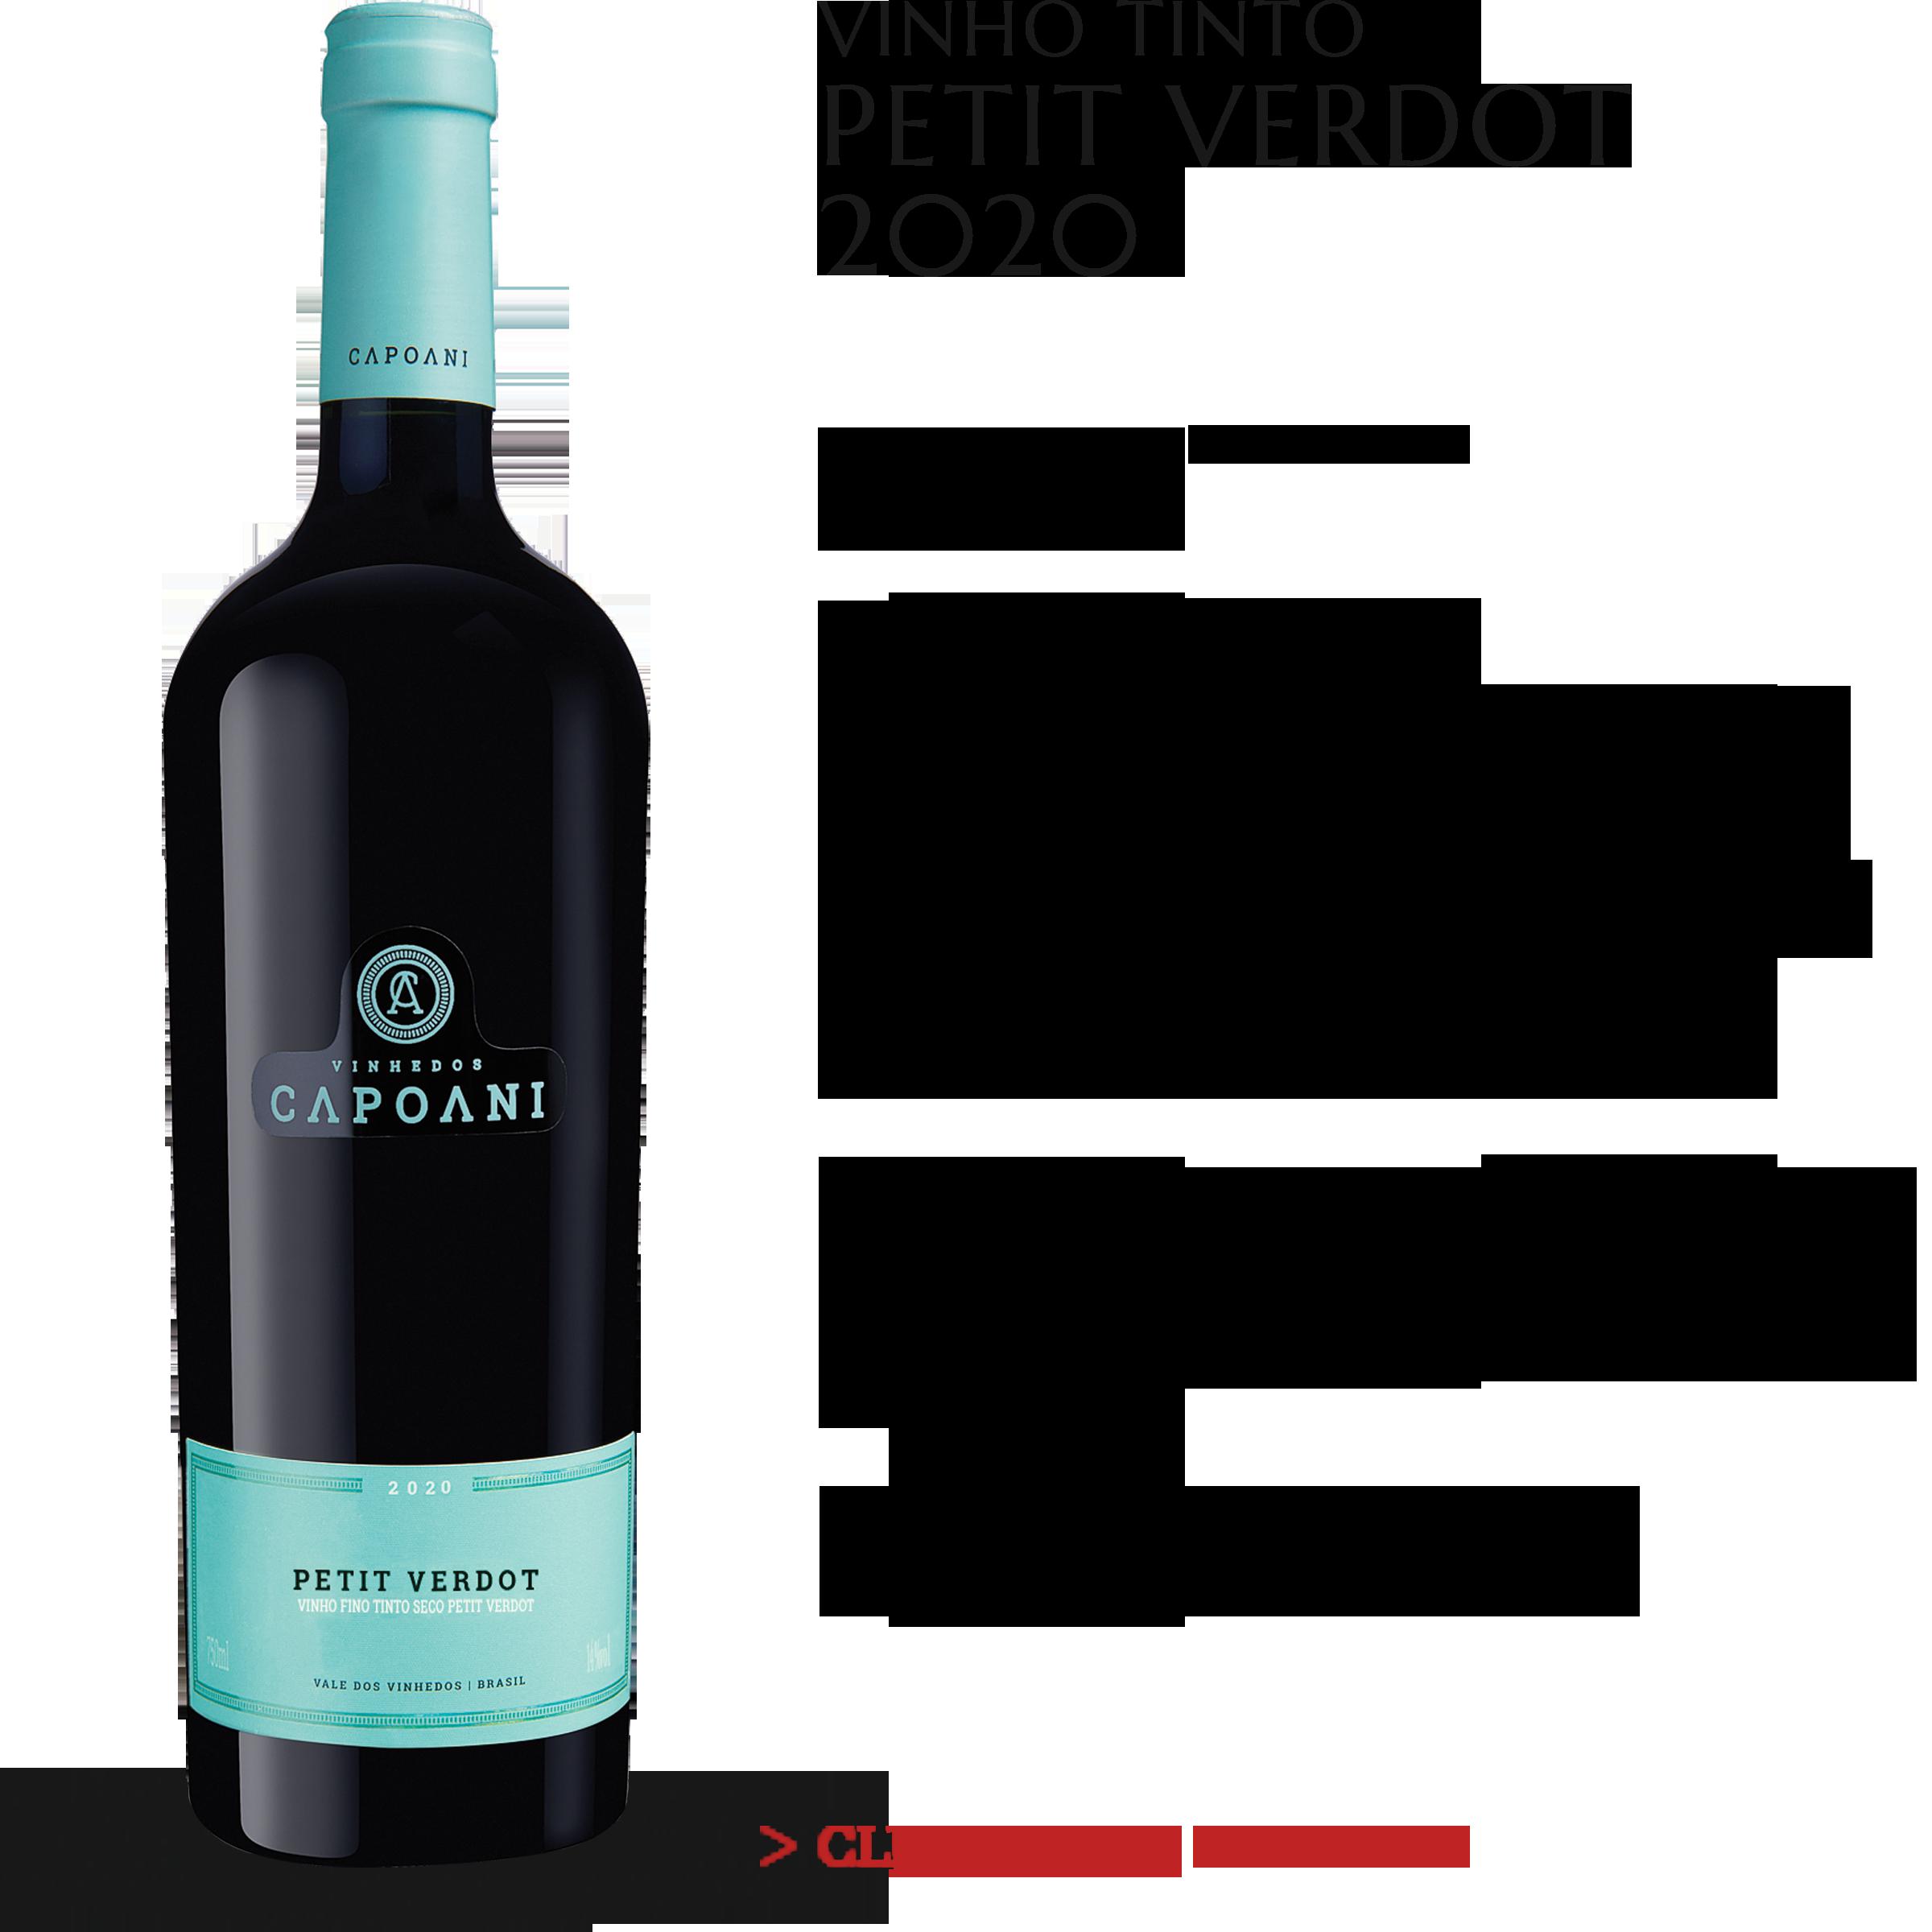 Vinho Tinto Petit Verdot 2020